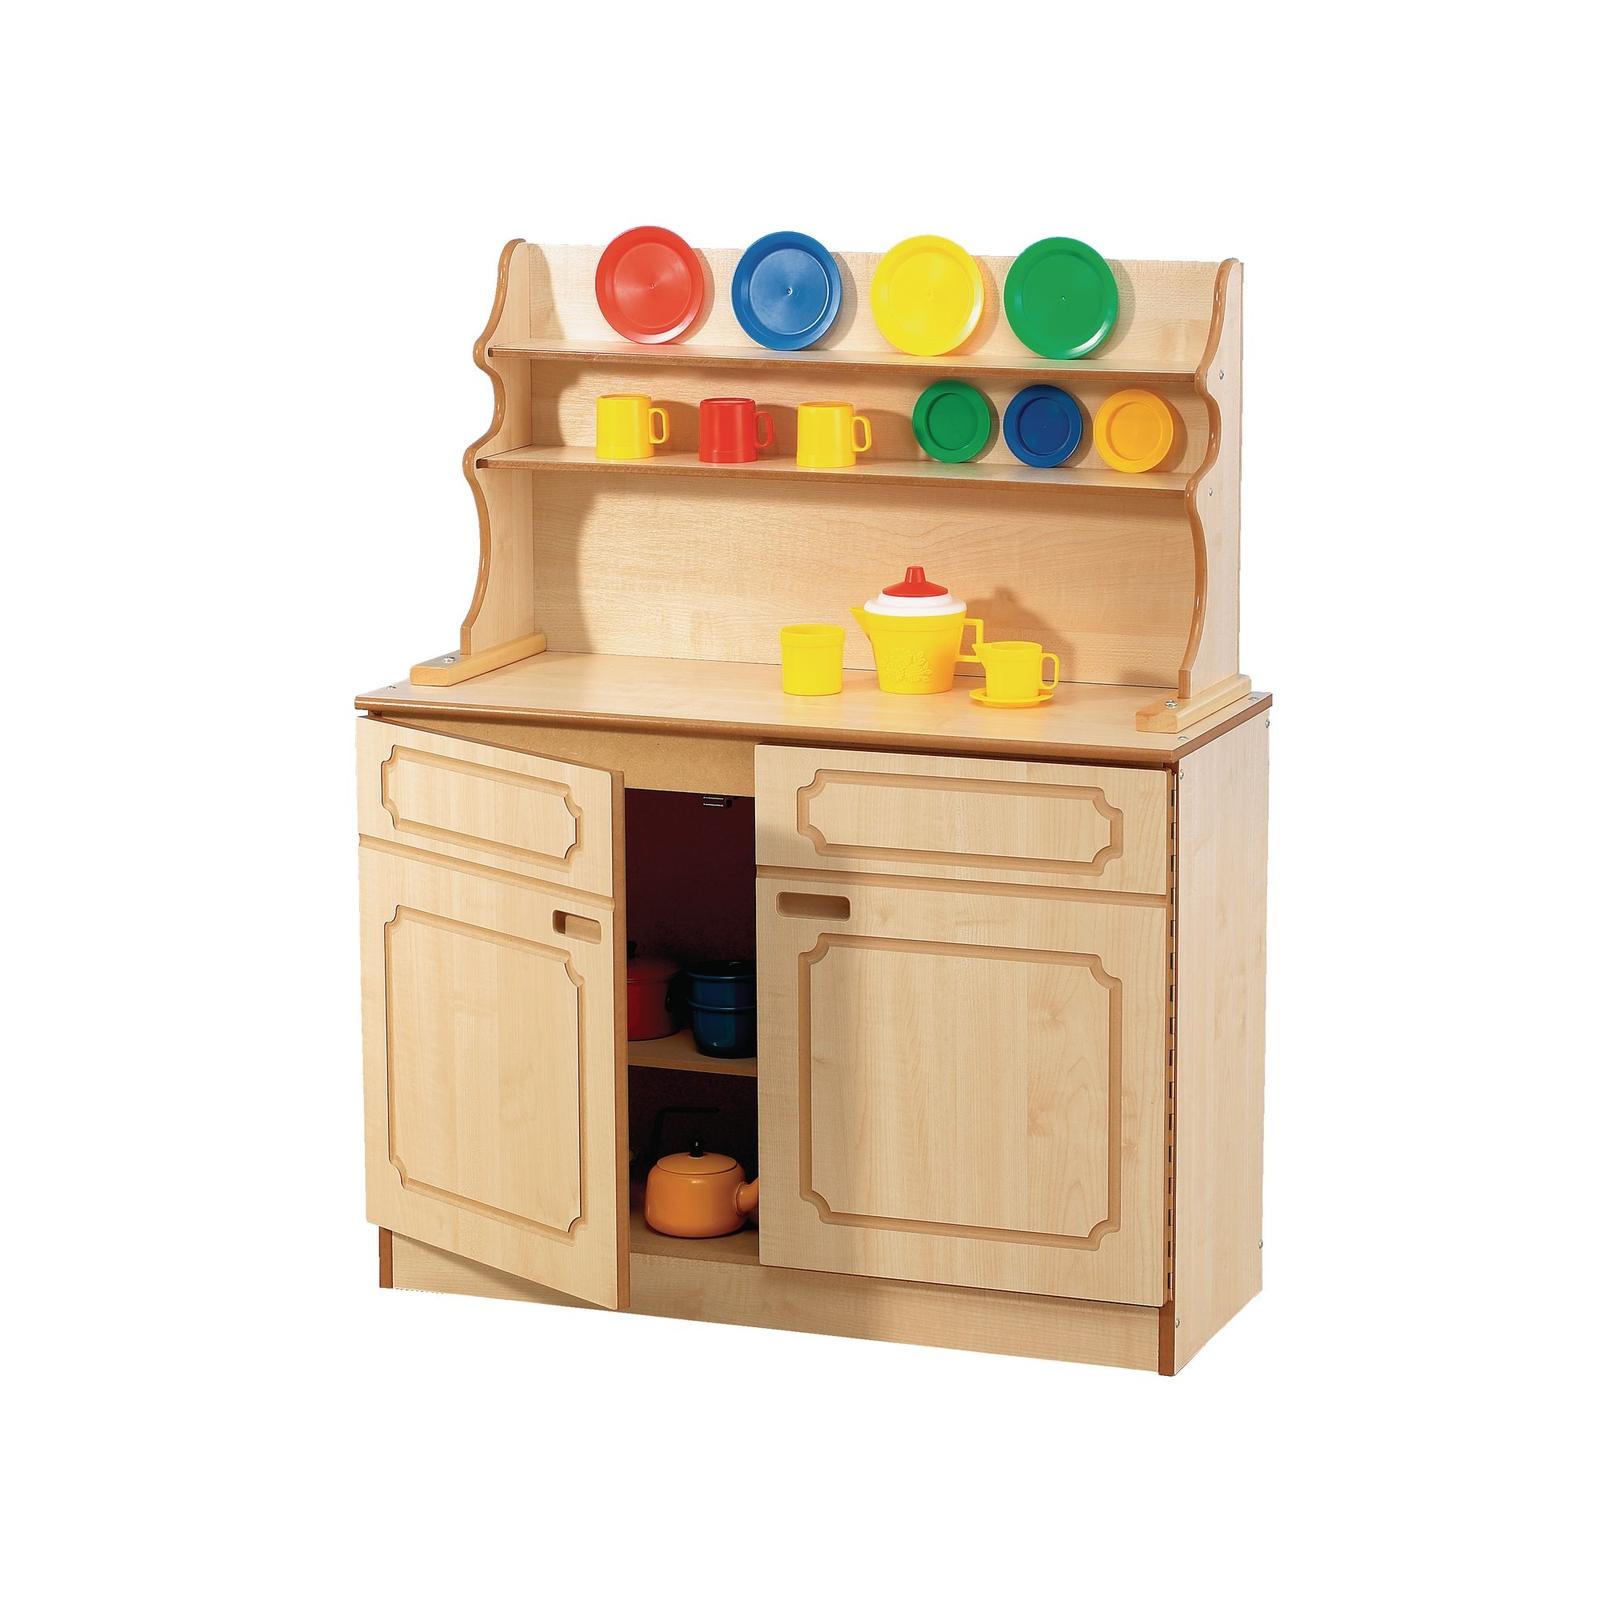 Ex Display Kitchen Cabinets Welsh Dresser Nursery Hope Education